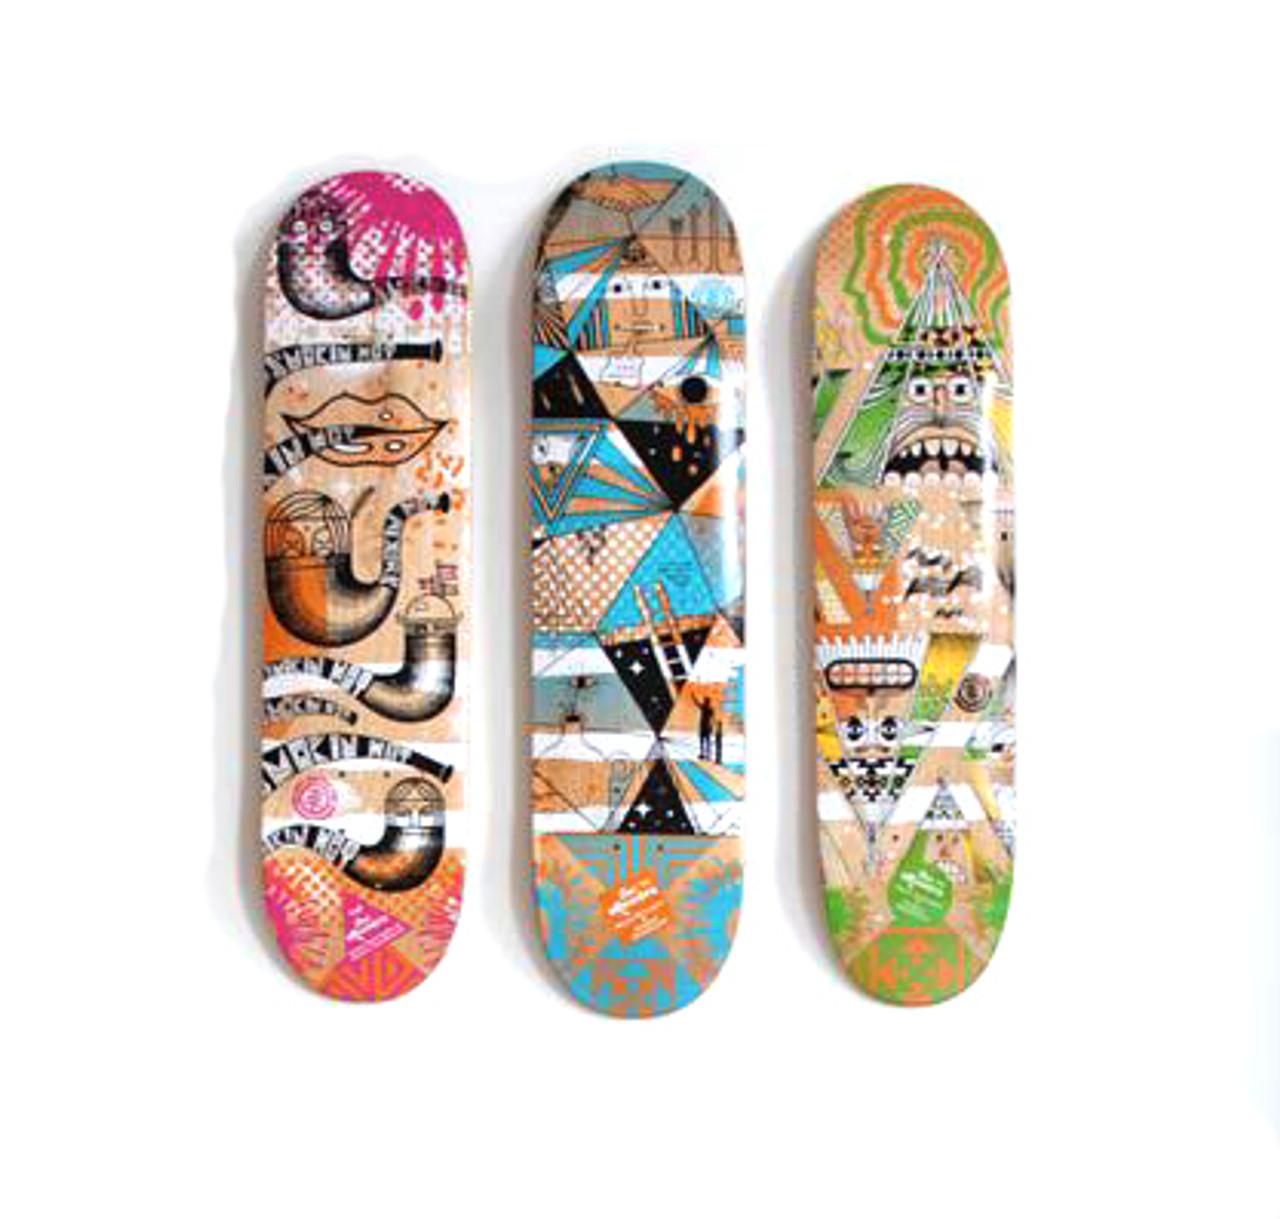 Skate Deck Display | Wooden - StoreYourBoard